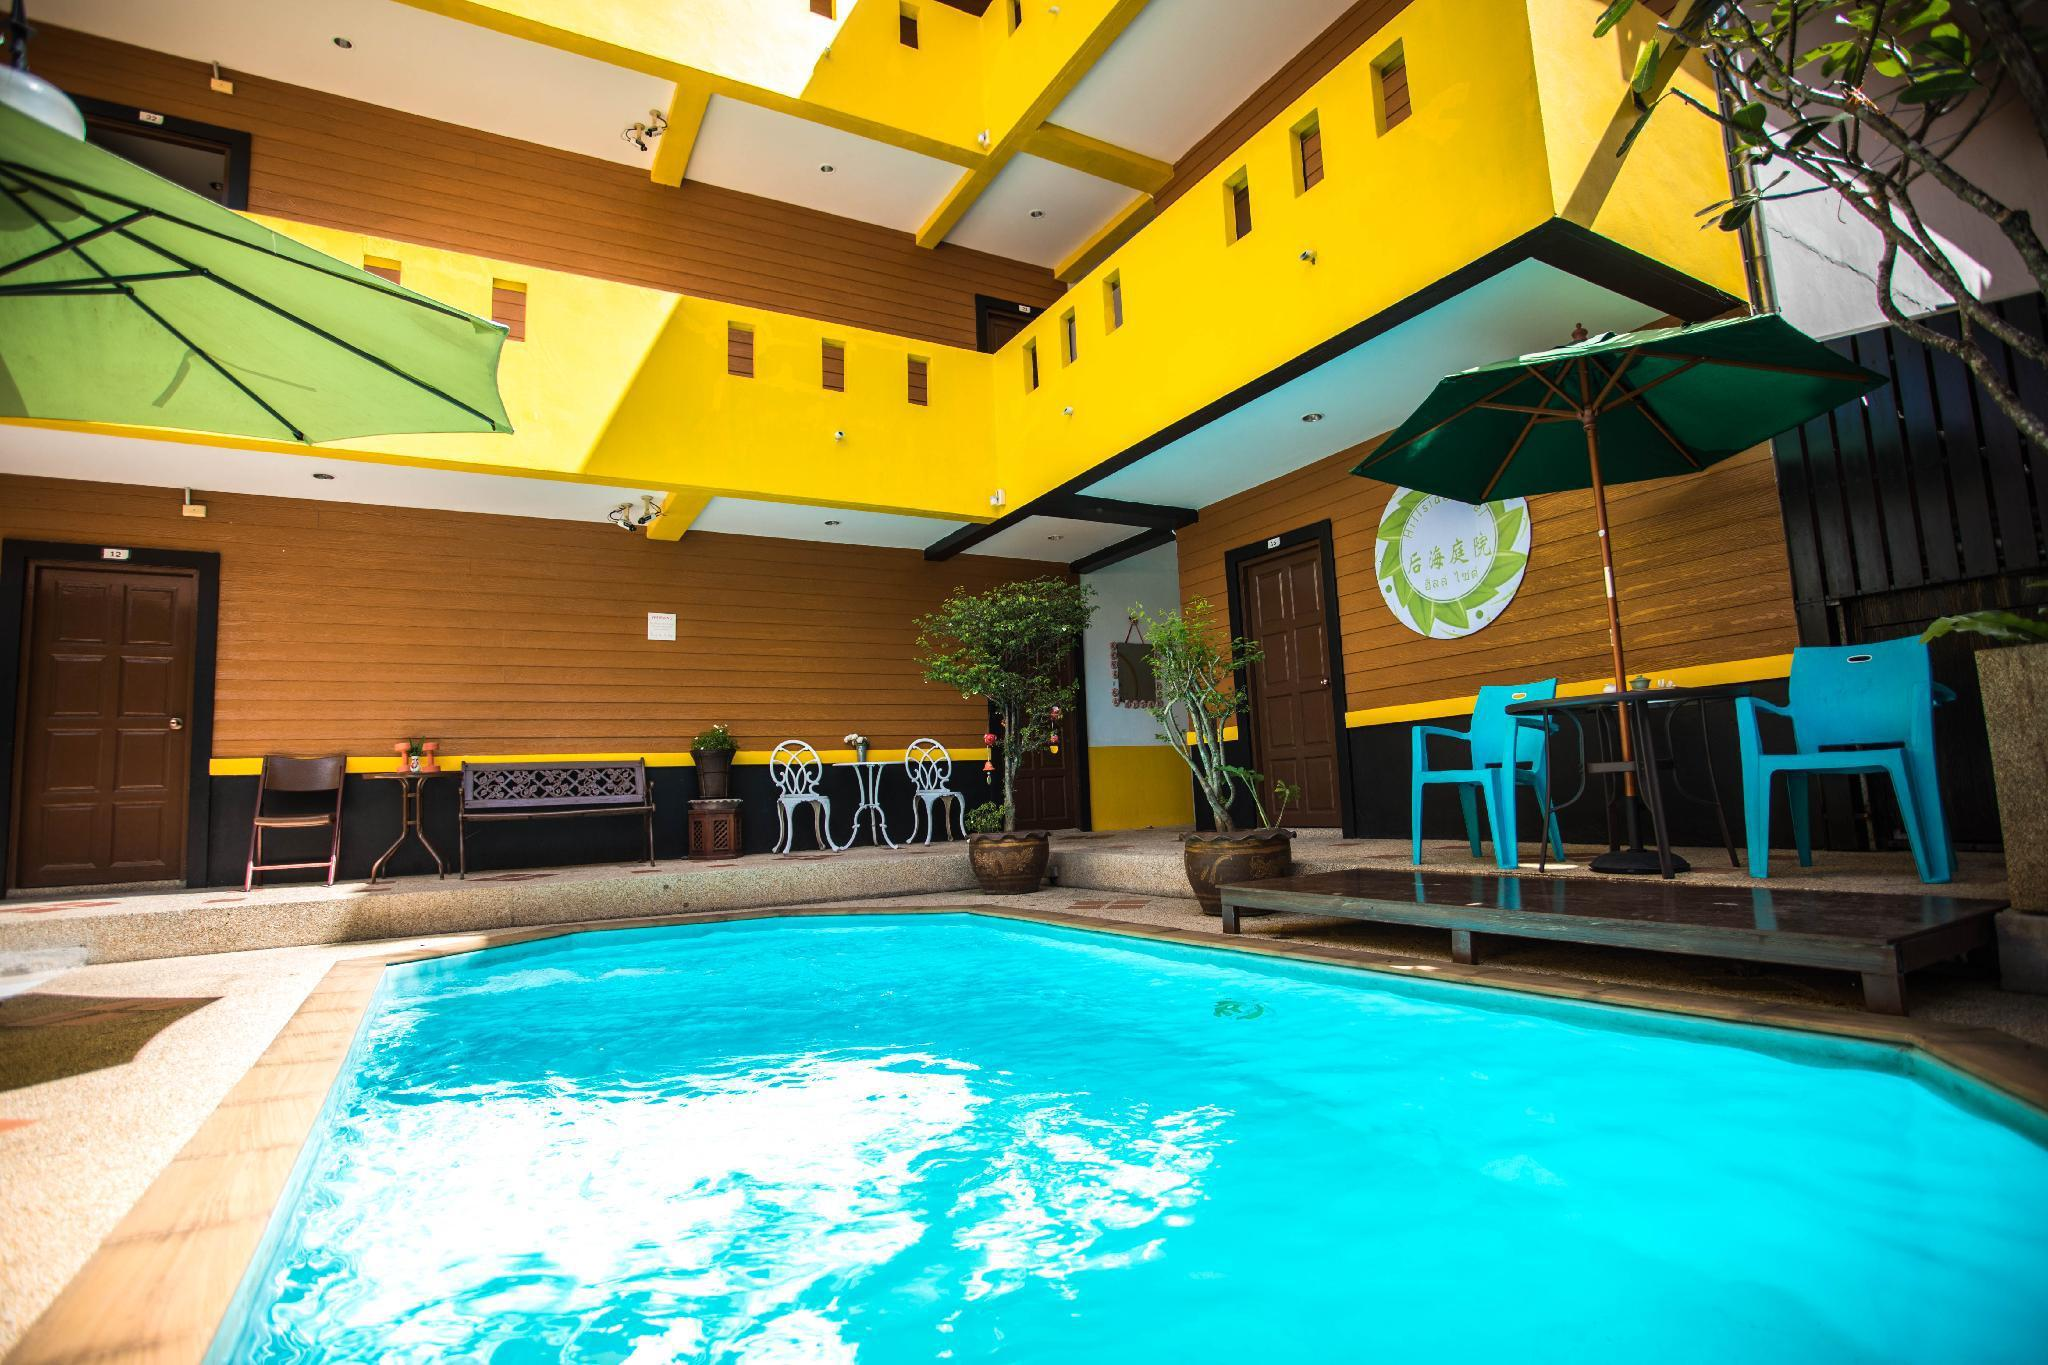 13Patong nice  swimming poolTHREE bed room อพาร์ตเมนต์ 1 ห้องนอน 1 ห้องน้ำส่วนตัว ขนาด 32 ตร.ม. – ป่าตอง